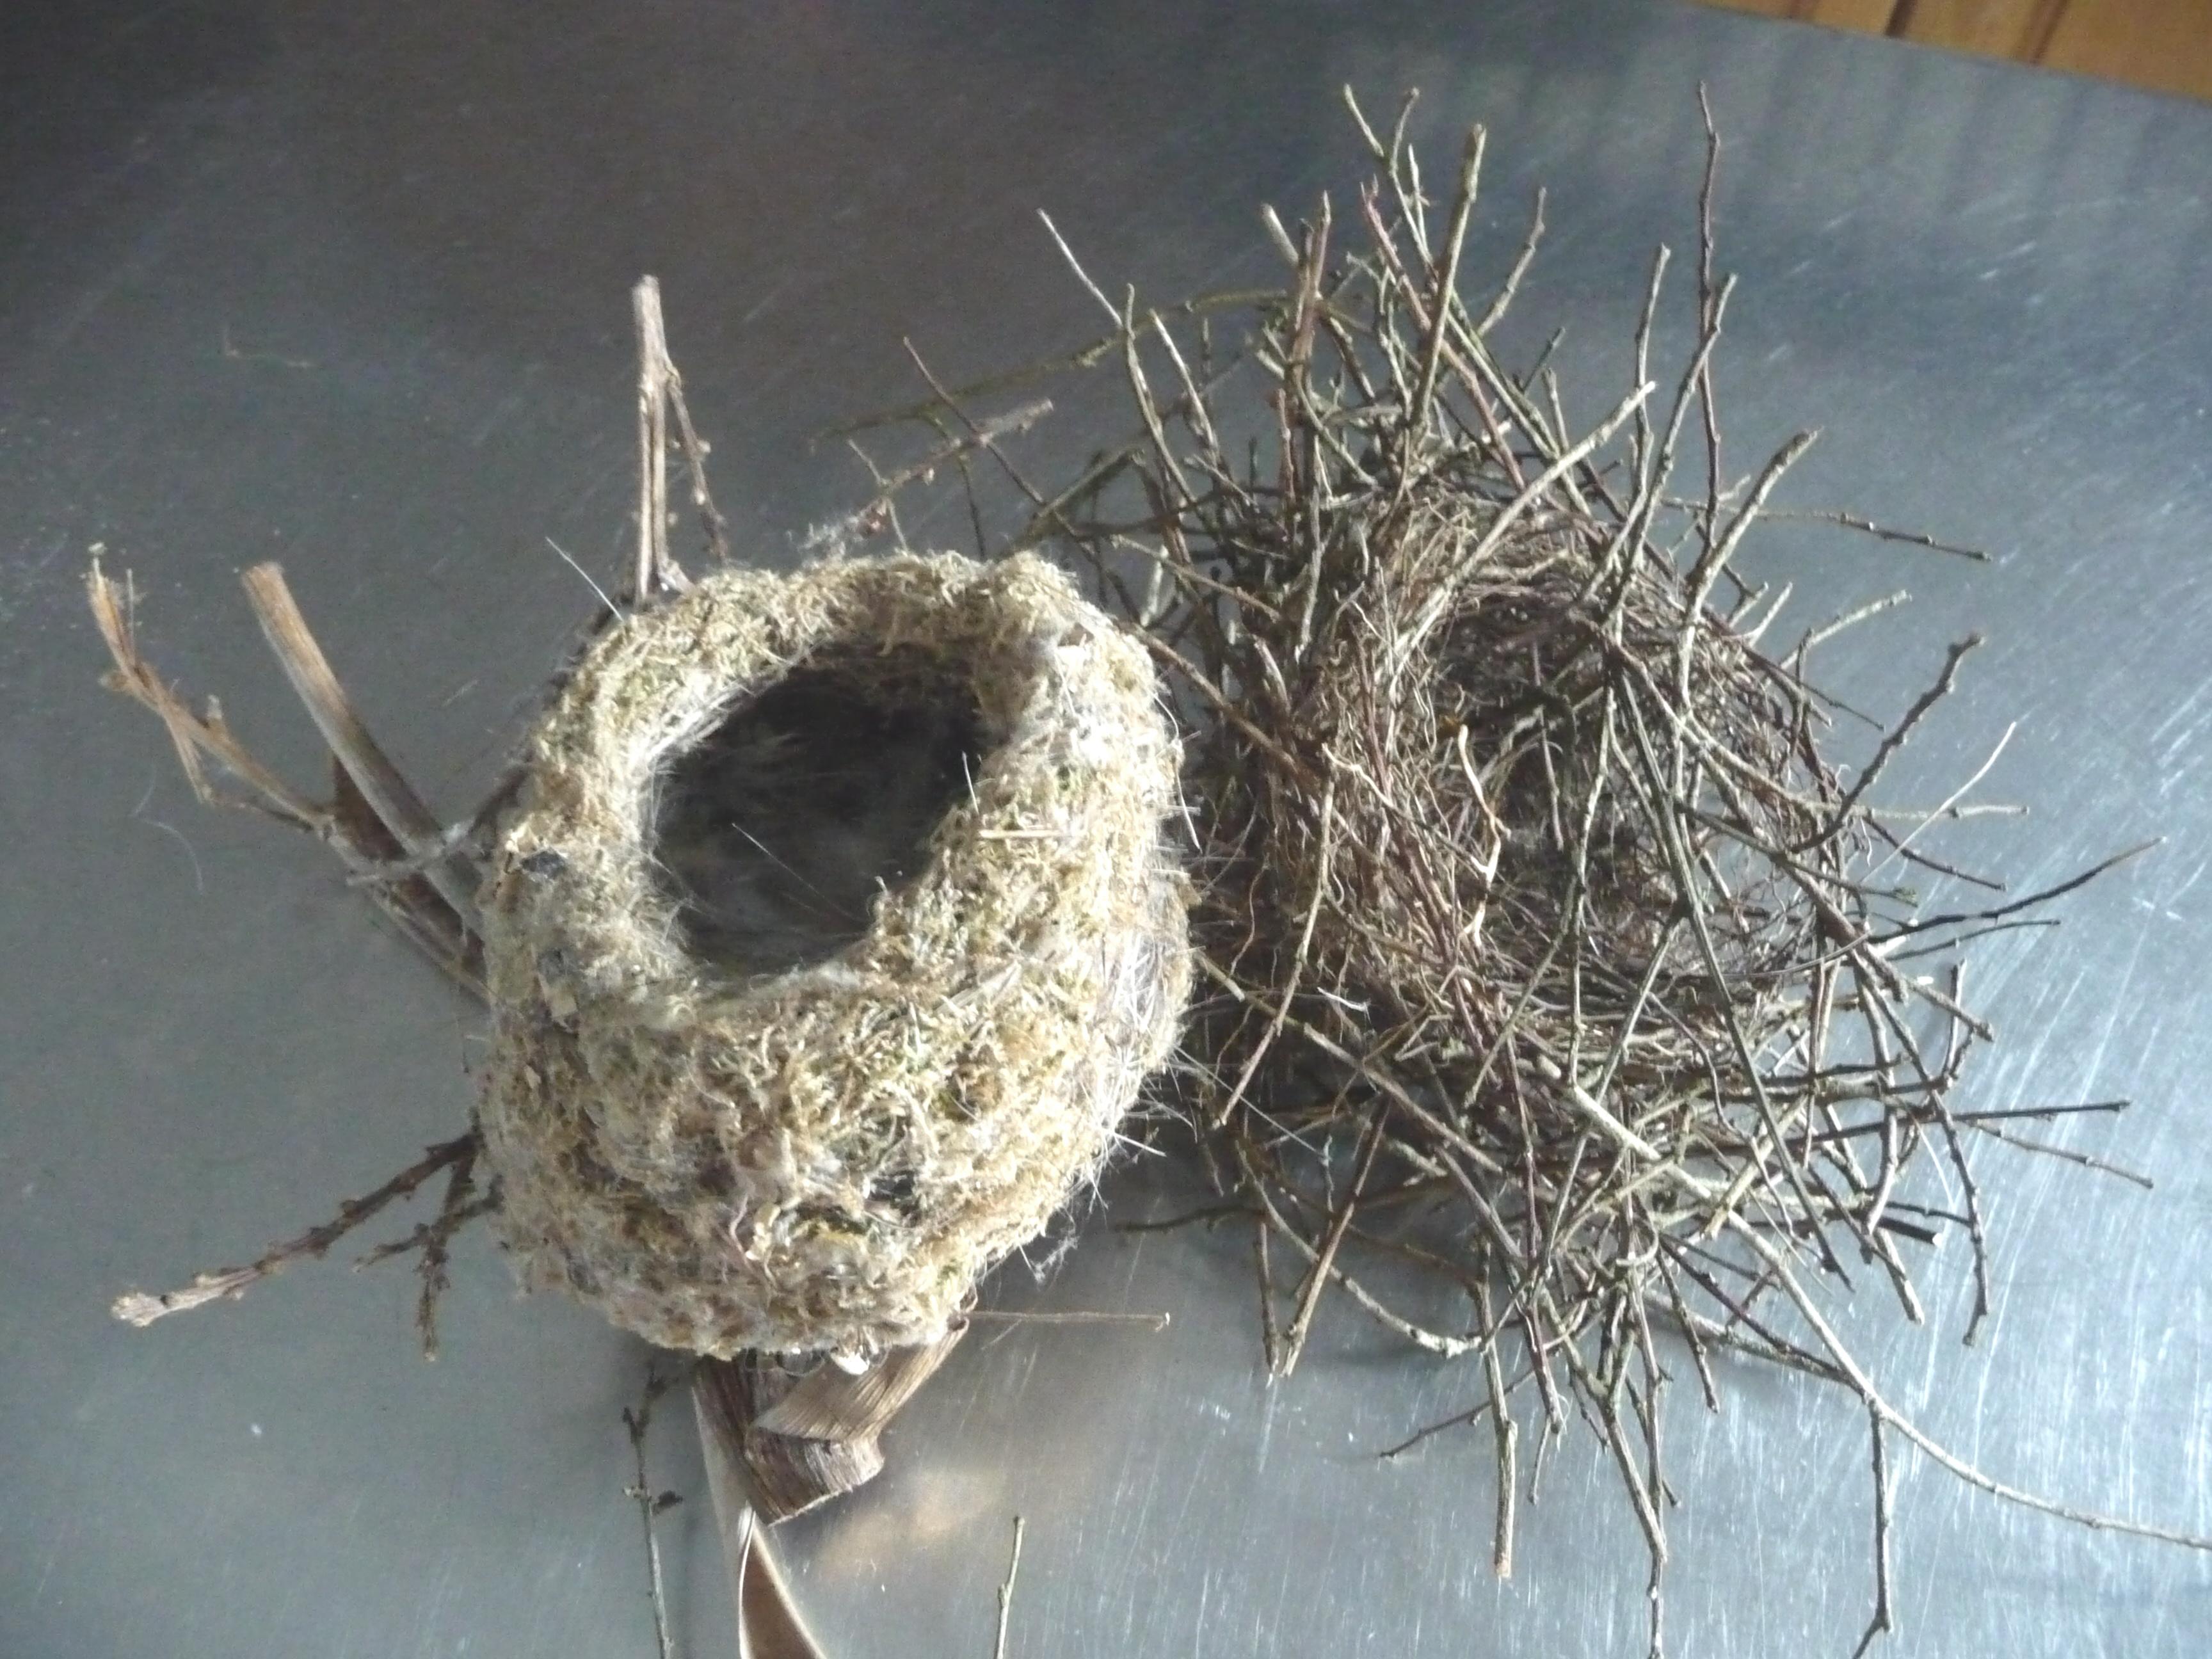 Bird Nests Birds' nests